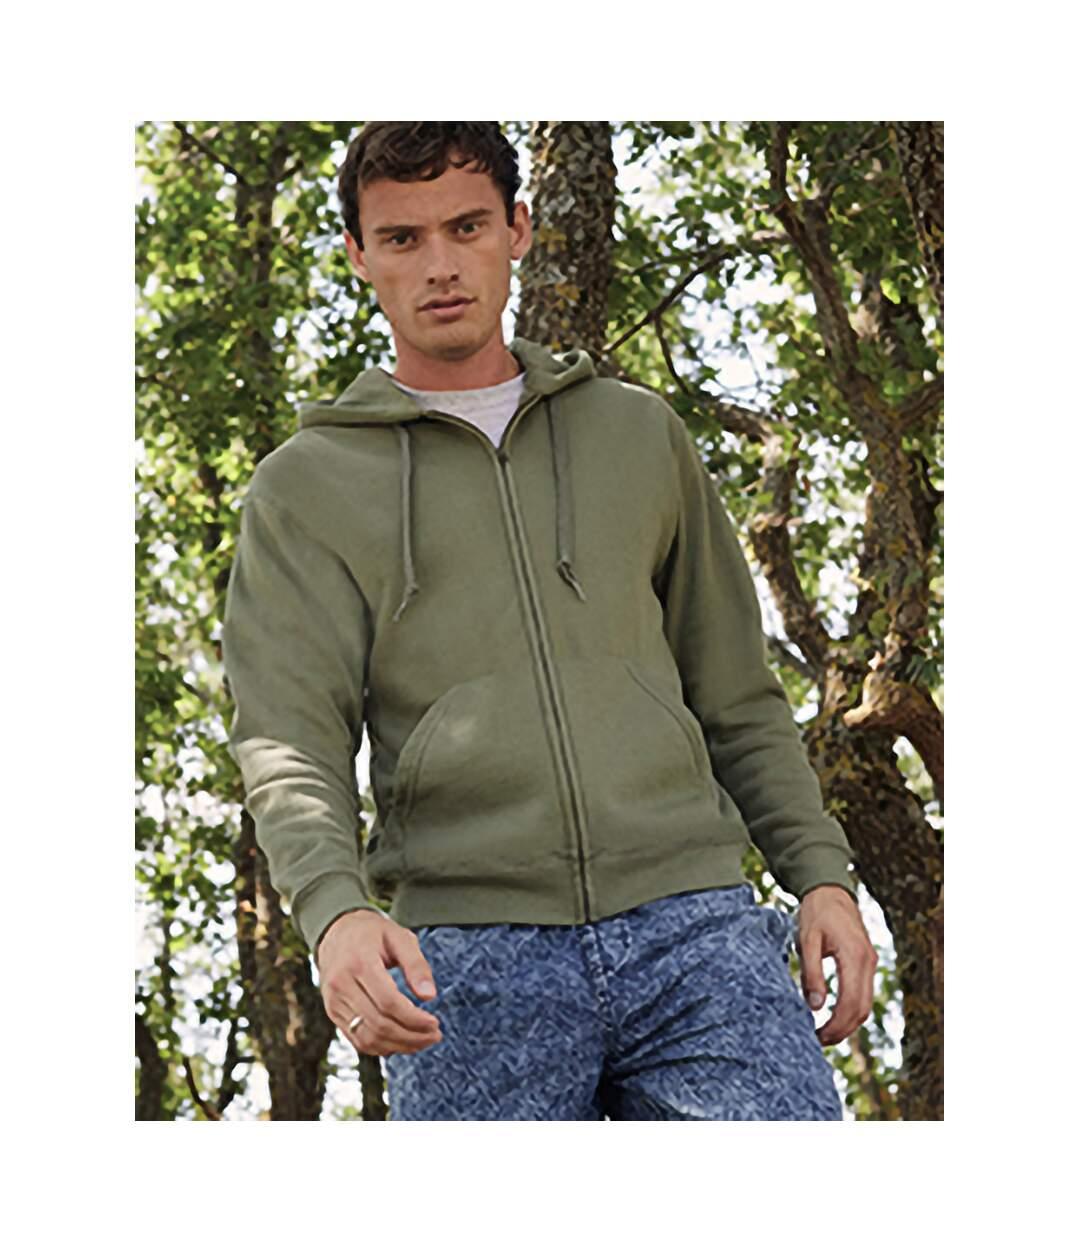 Fruit Of The Loom Mens Hooded Sweatshirt (Classic Olive) - UTBC1369